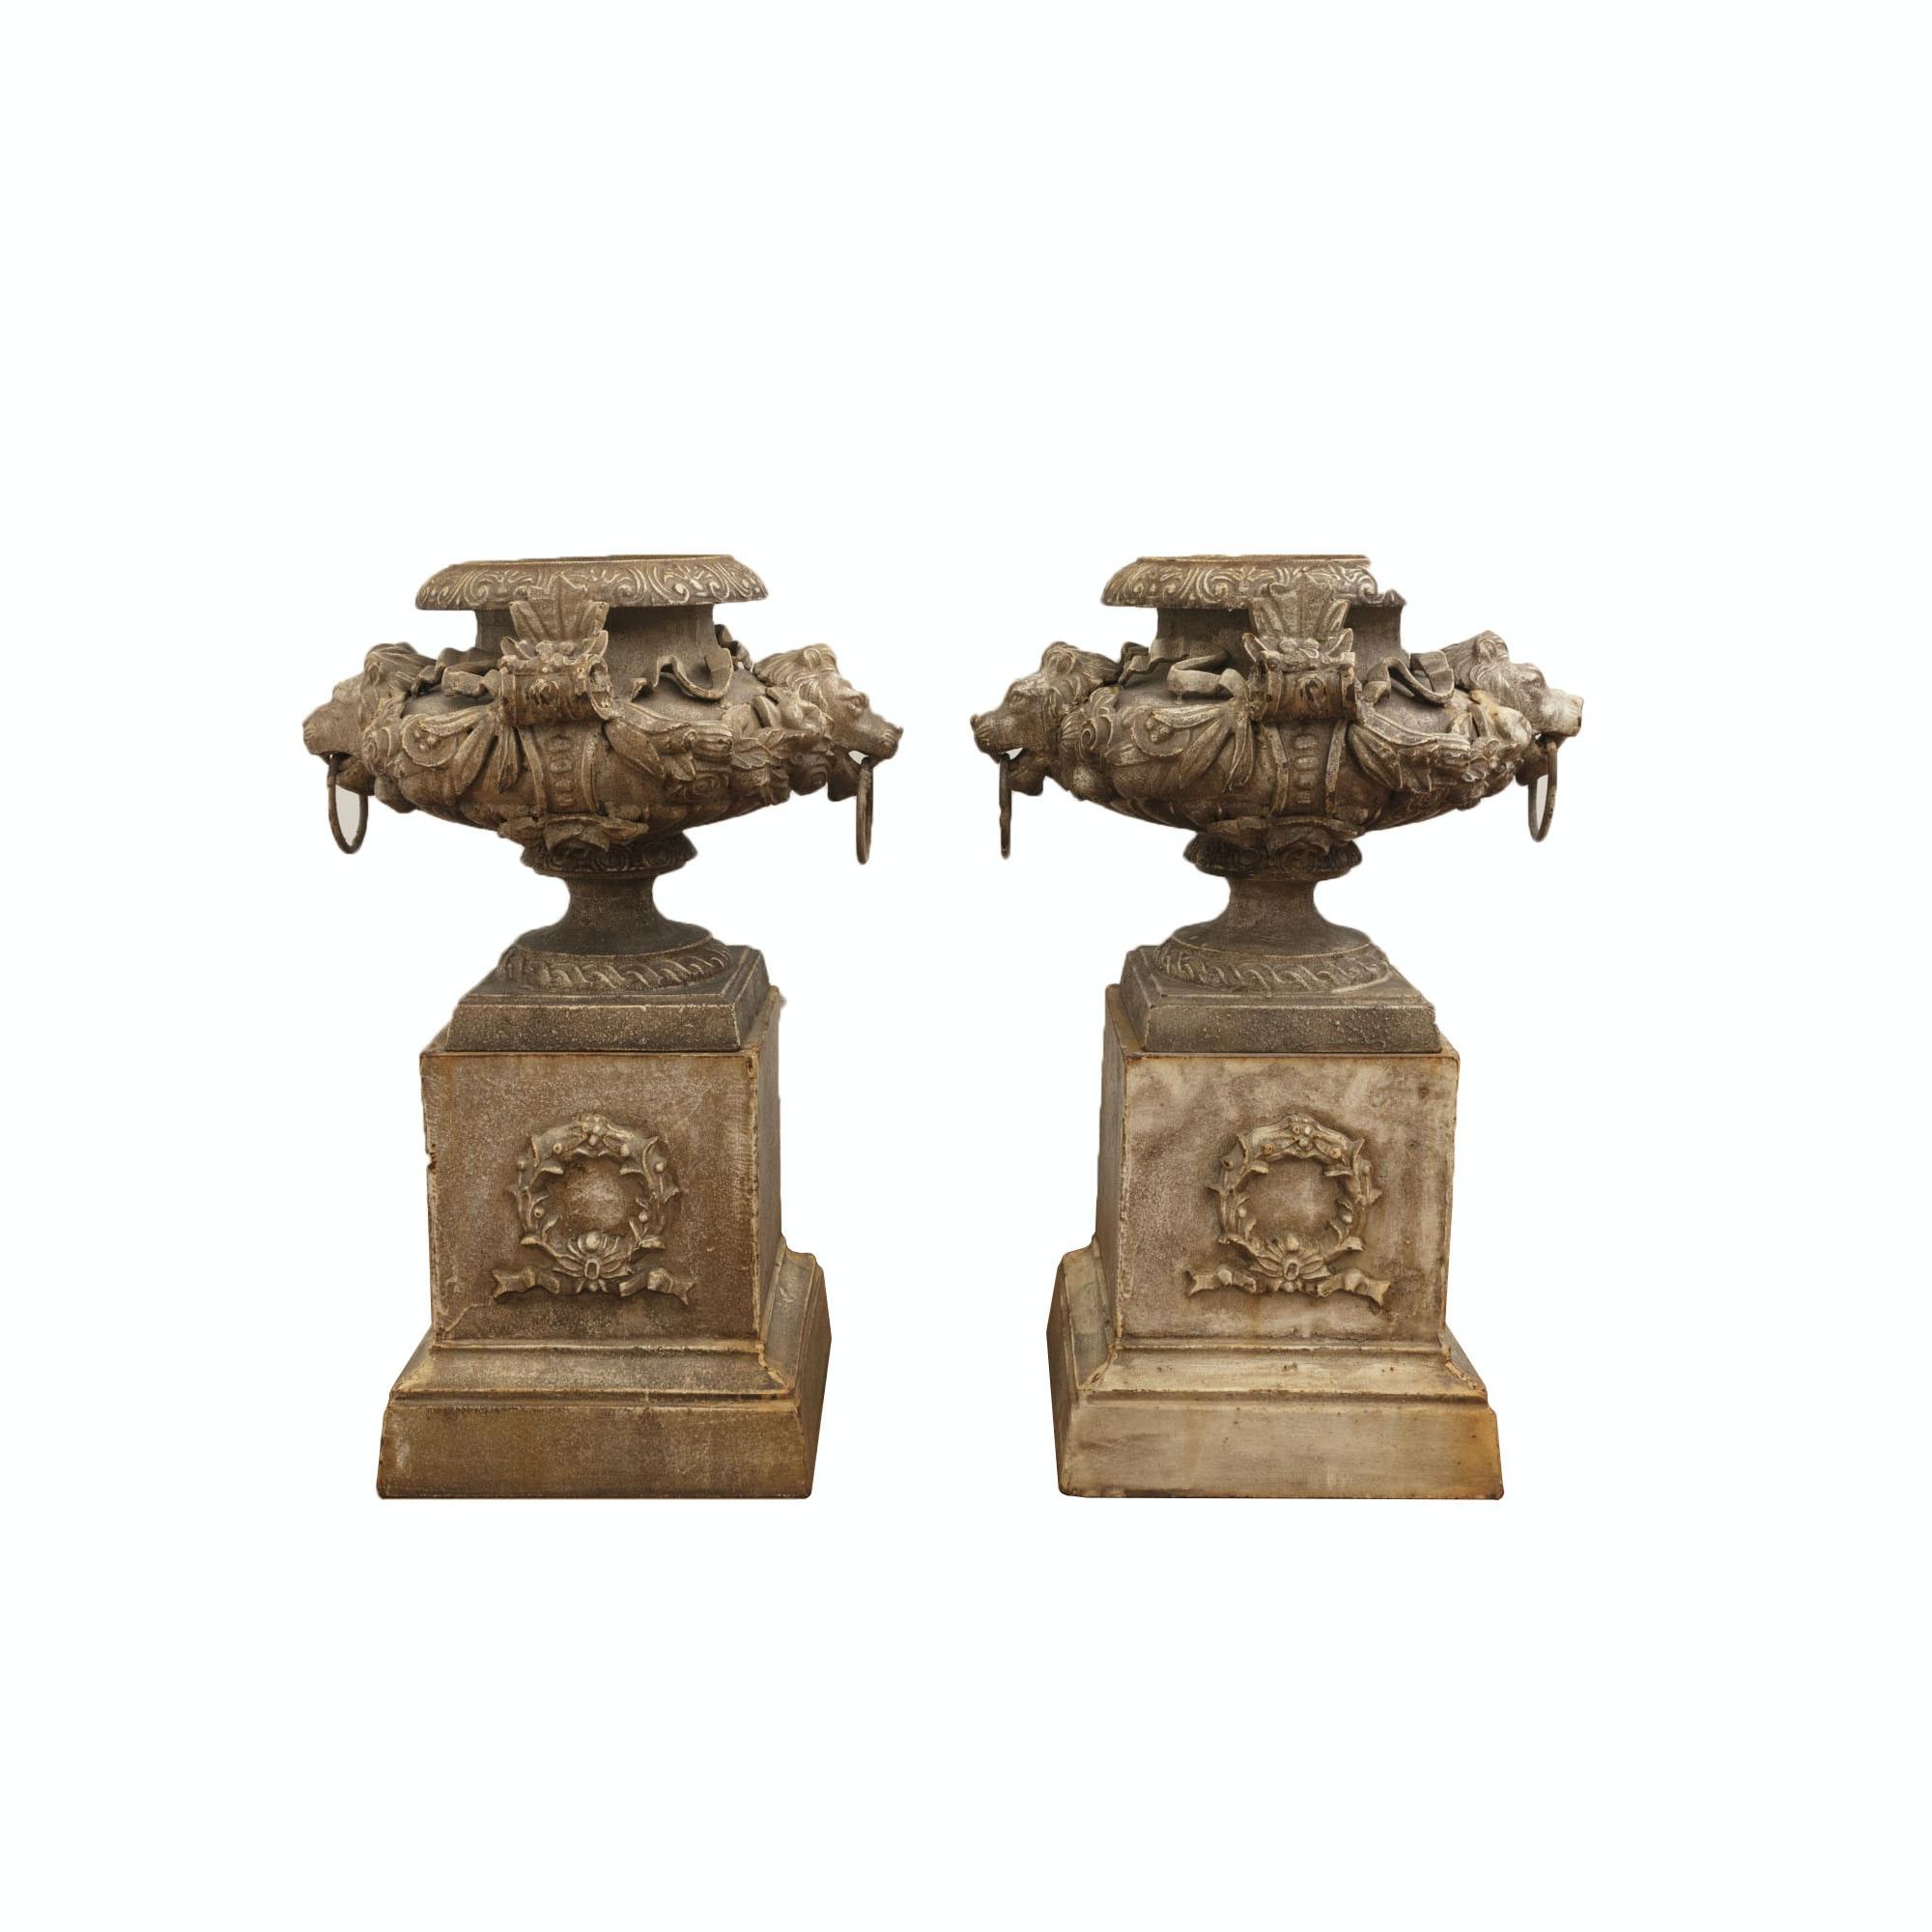 Vintage Rococo Revival Cast Iron Urns on Pedestals